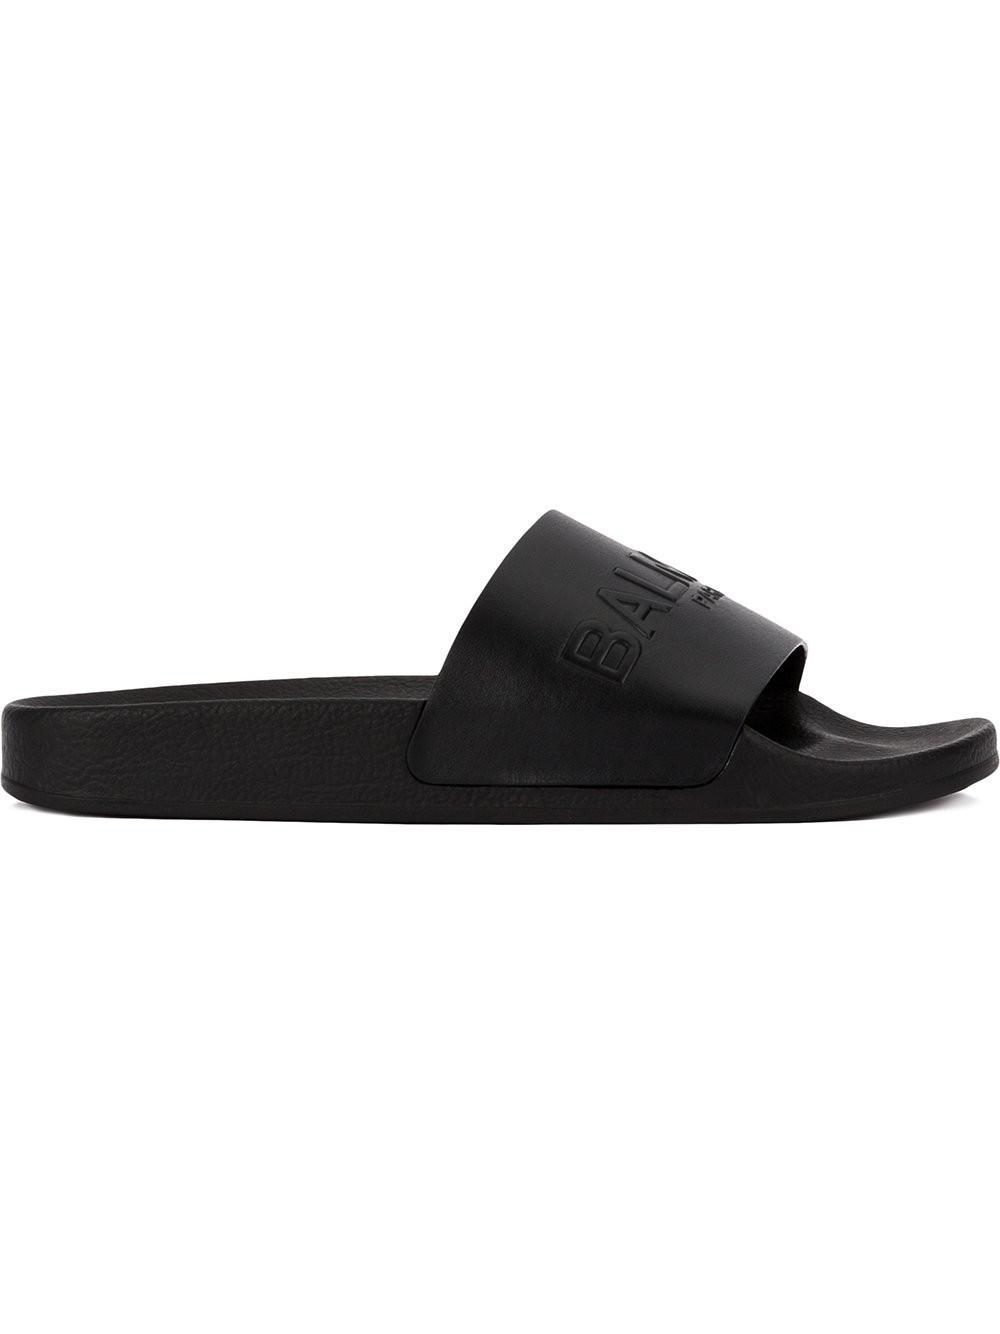 Balmain embossed logo slide sandals 2014 new cheap sale newest tumblr sale online e3gy0197